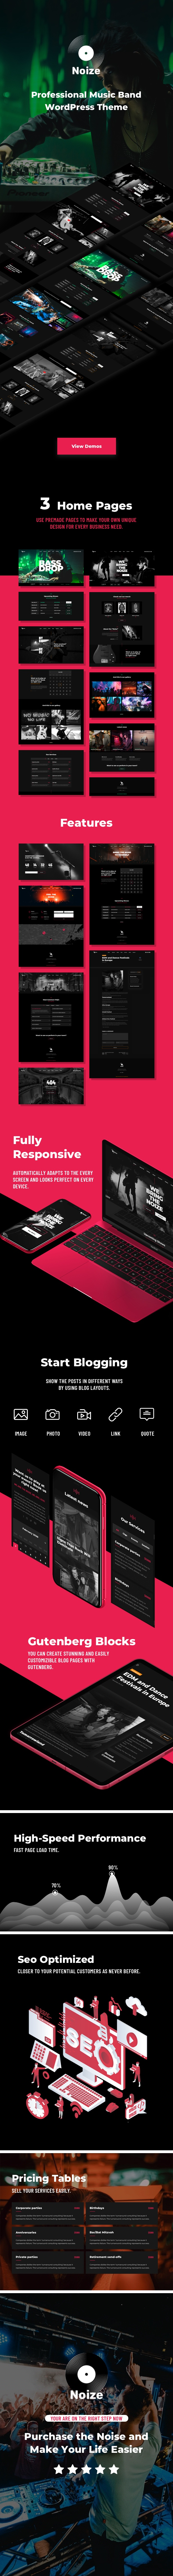 Noize - Music Industry WordPress - 1